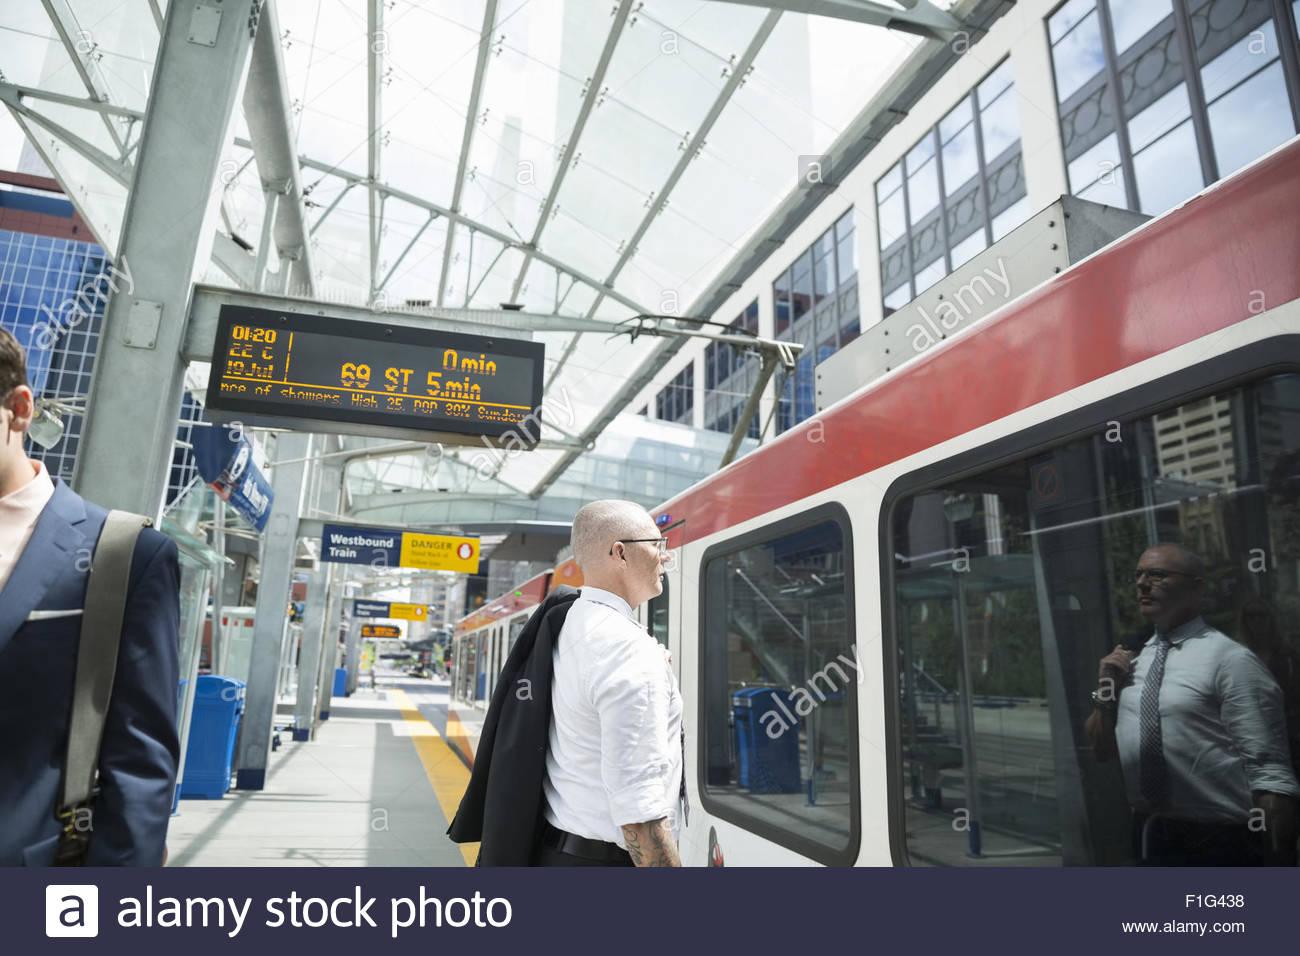 Businessman at commuter train on platform - Stock Image